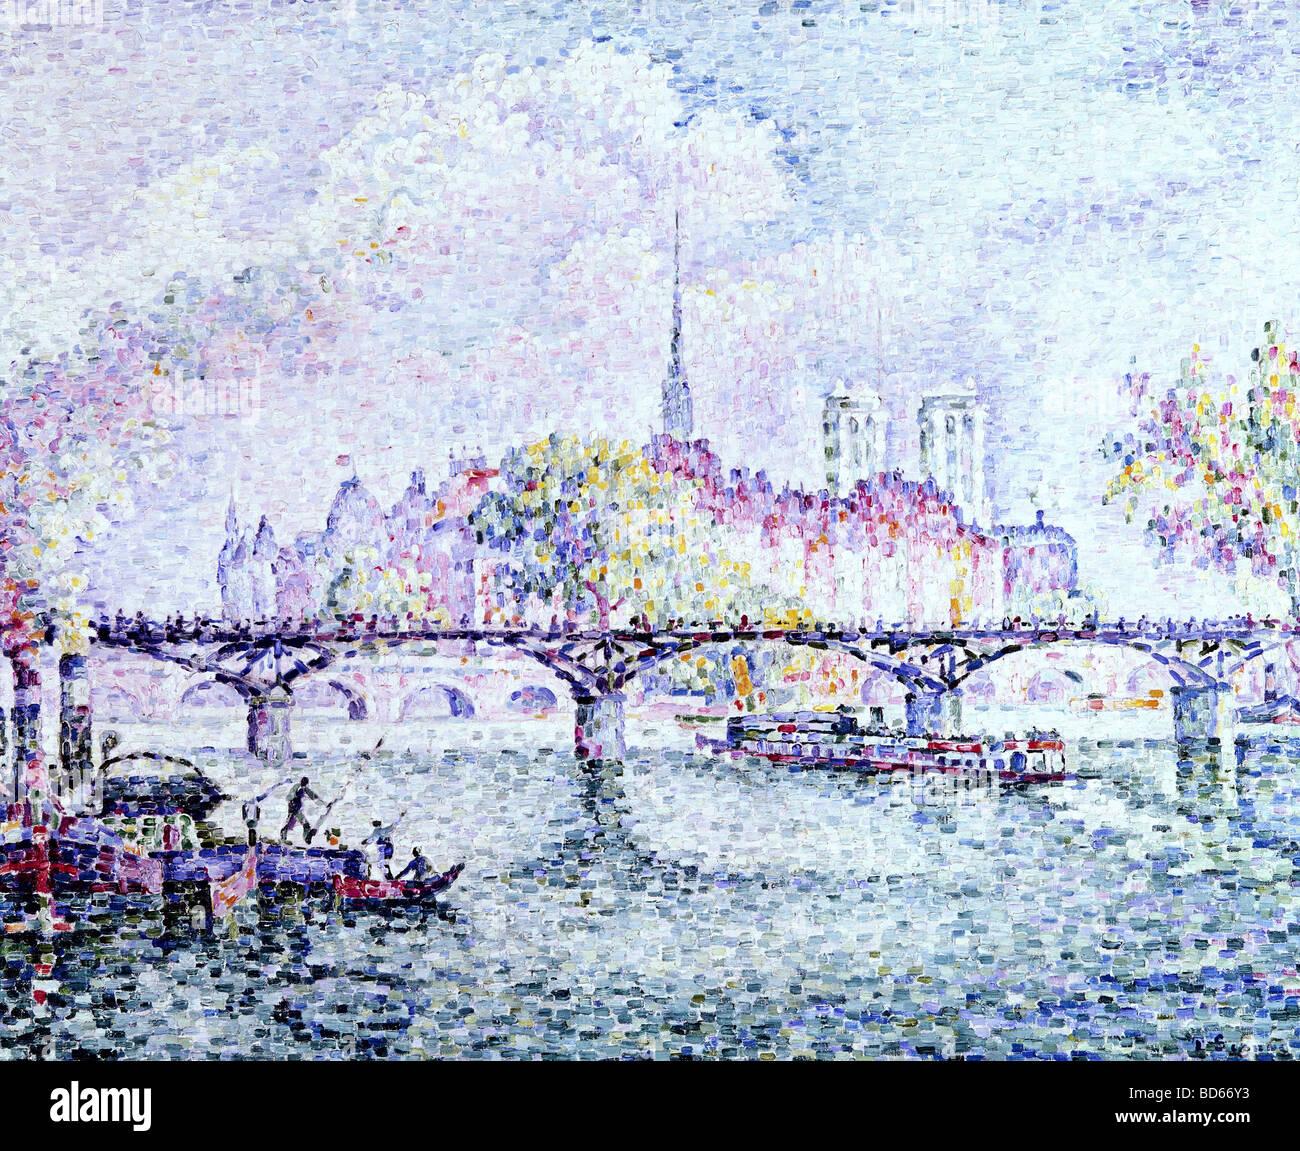 "Belle arti, Signac Paul, (1863 - 1935), pittura, 'Parigi, Ile de la Cite"", 1912, olio su tela, il Museum Folkwang Foto Stock"